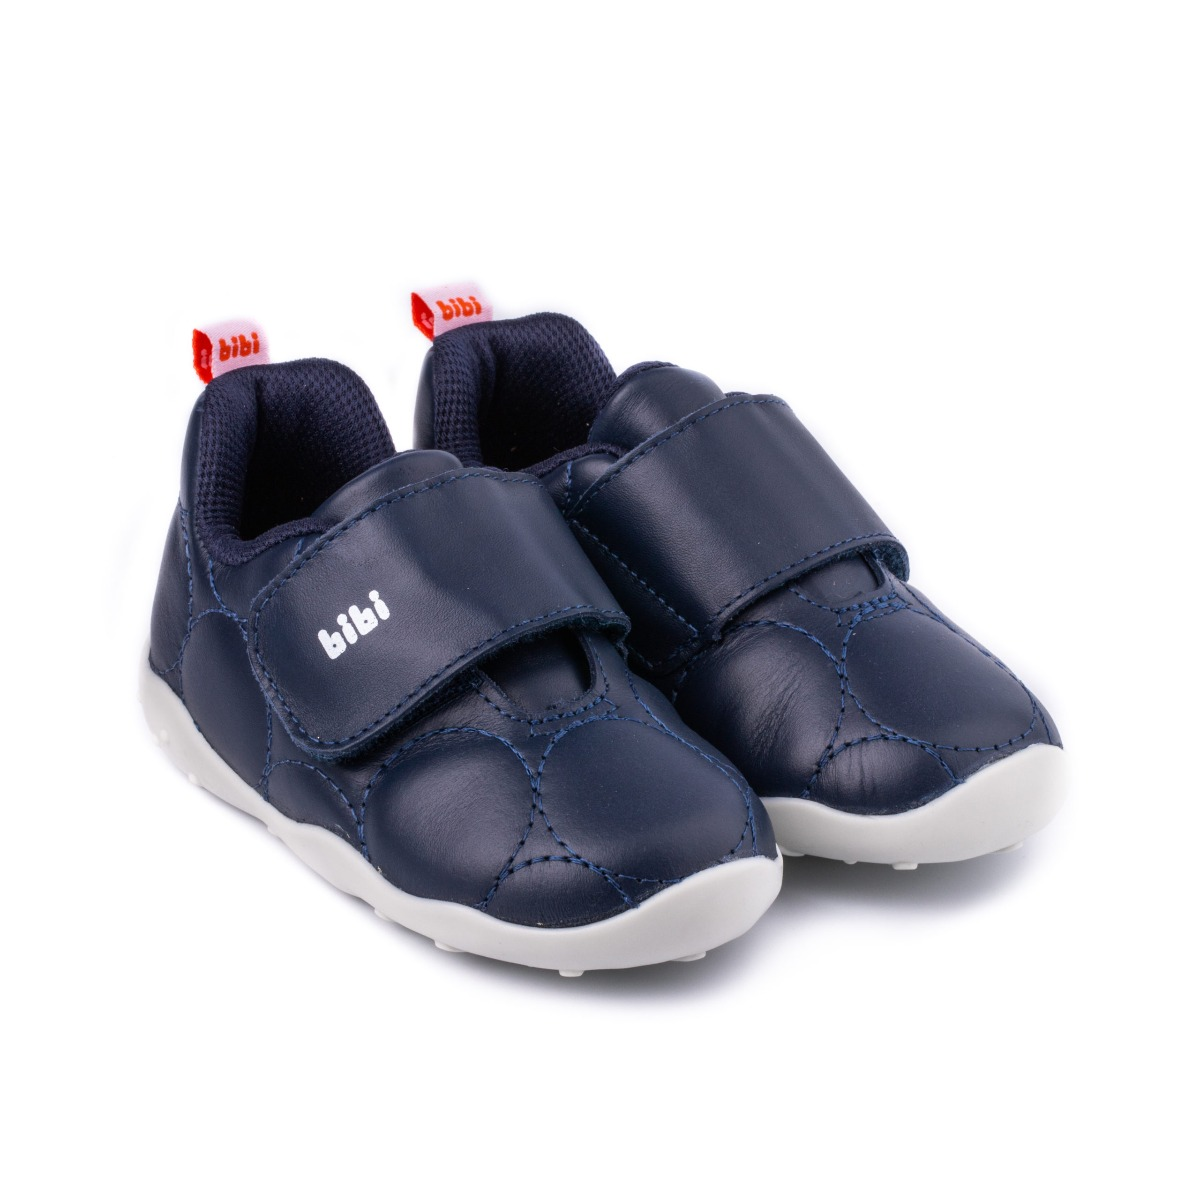 Pantofi sport Bibi Shoes Fisioflex Naval, Bleumarin imagine